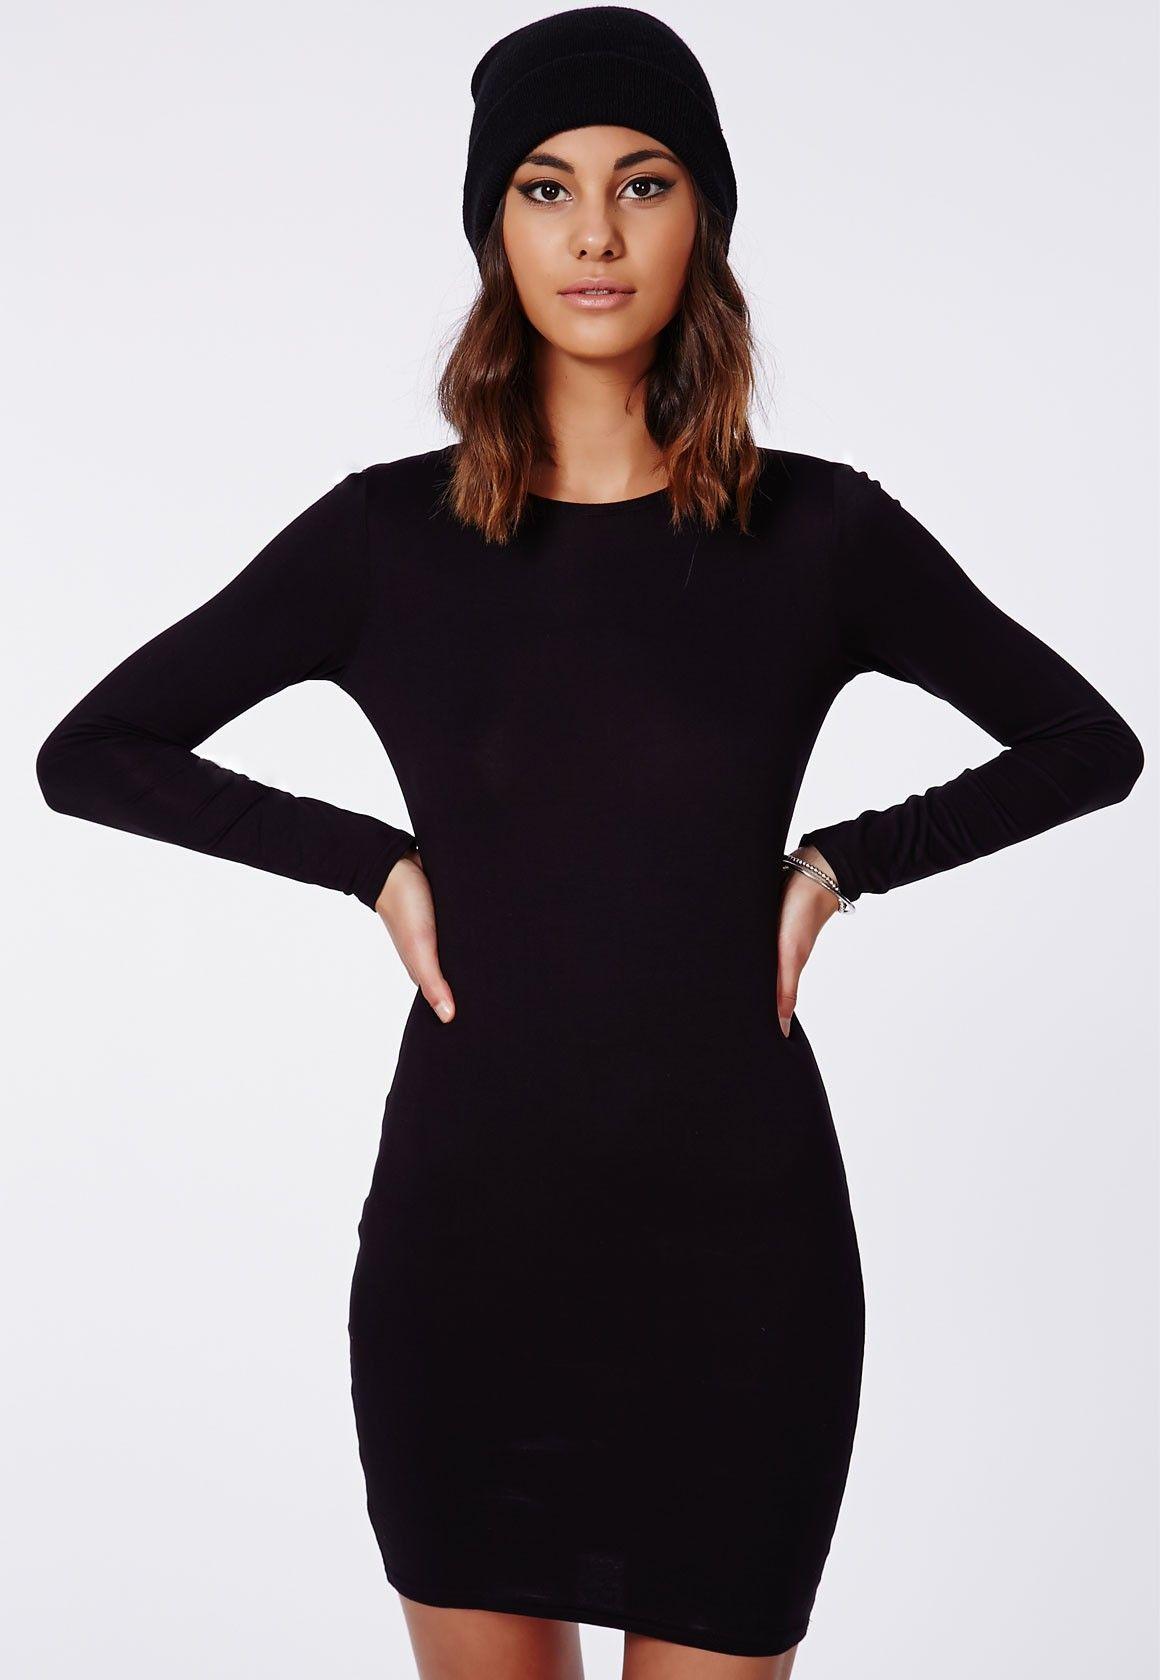 Rainey Long Sleeve Bodycon Dress Black Dresses Bodycon Dresses